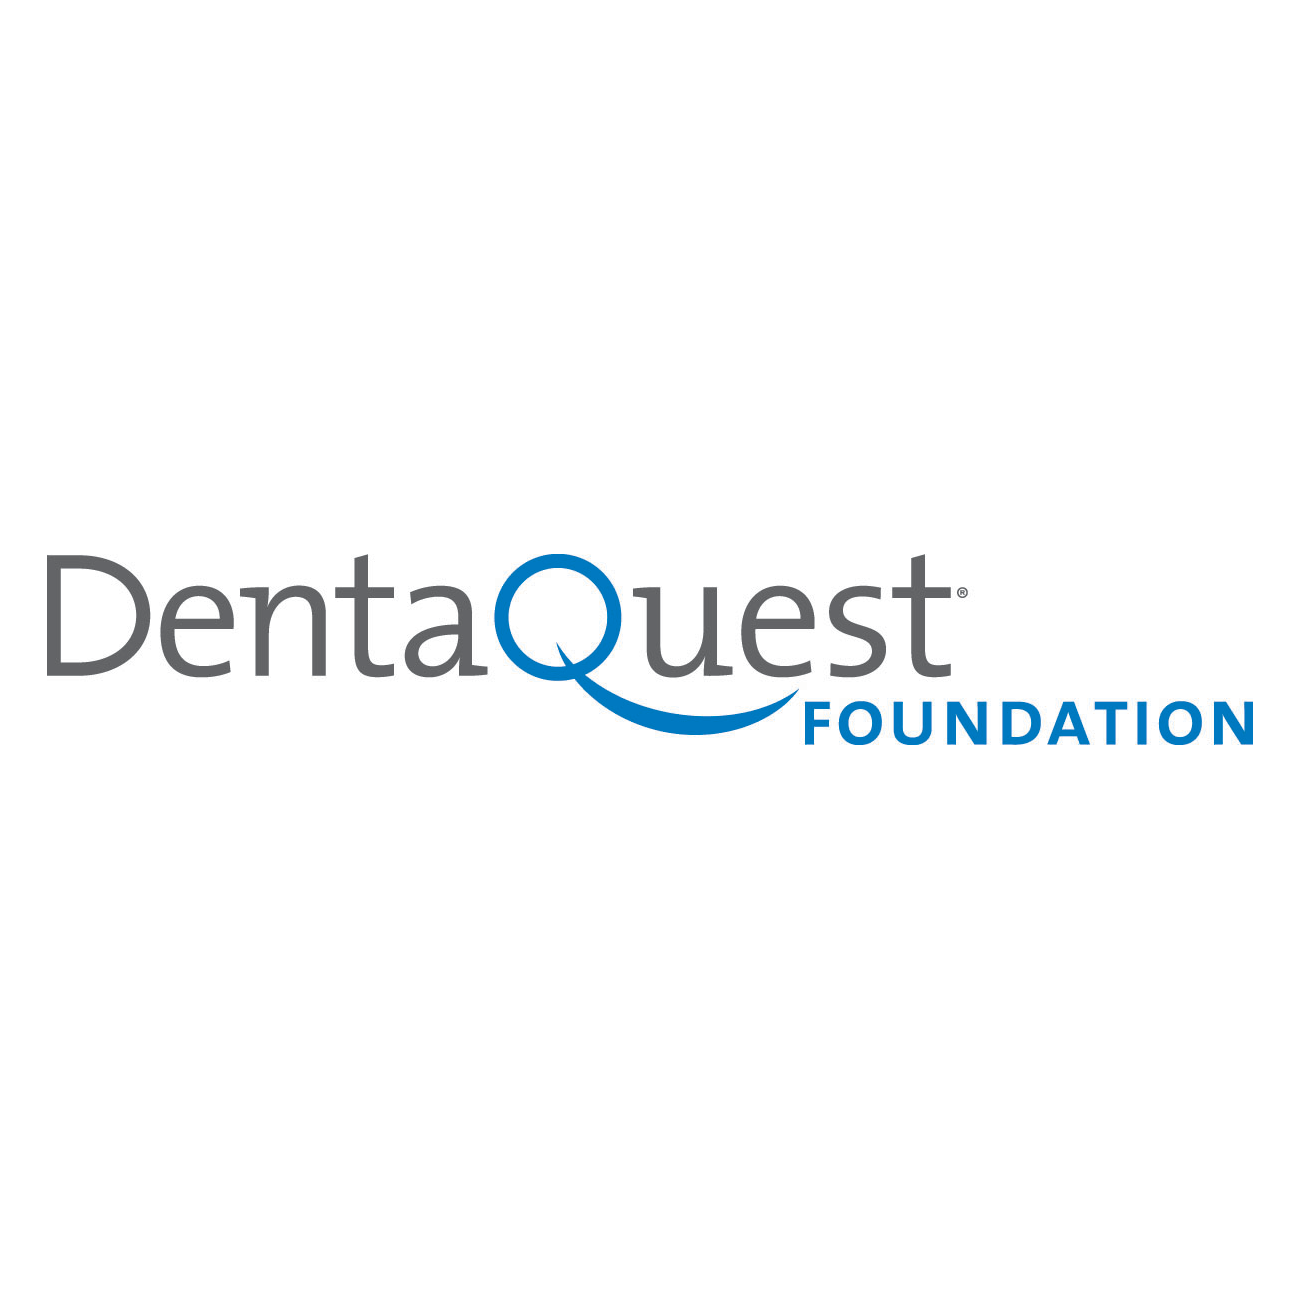 DentaQuest Foundation